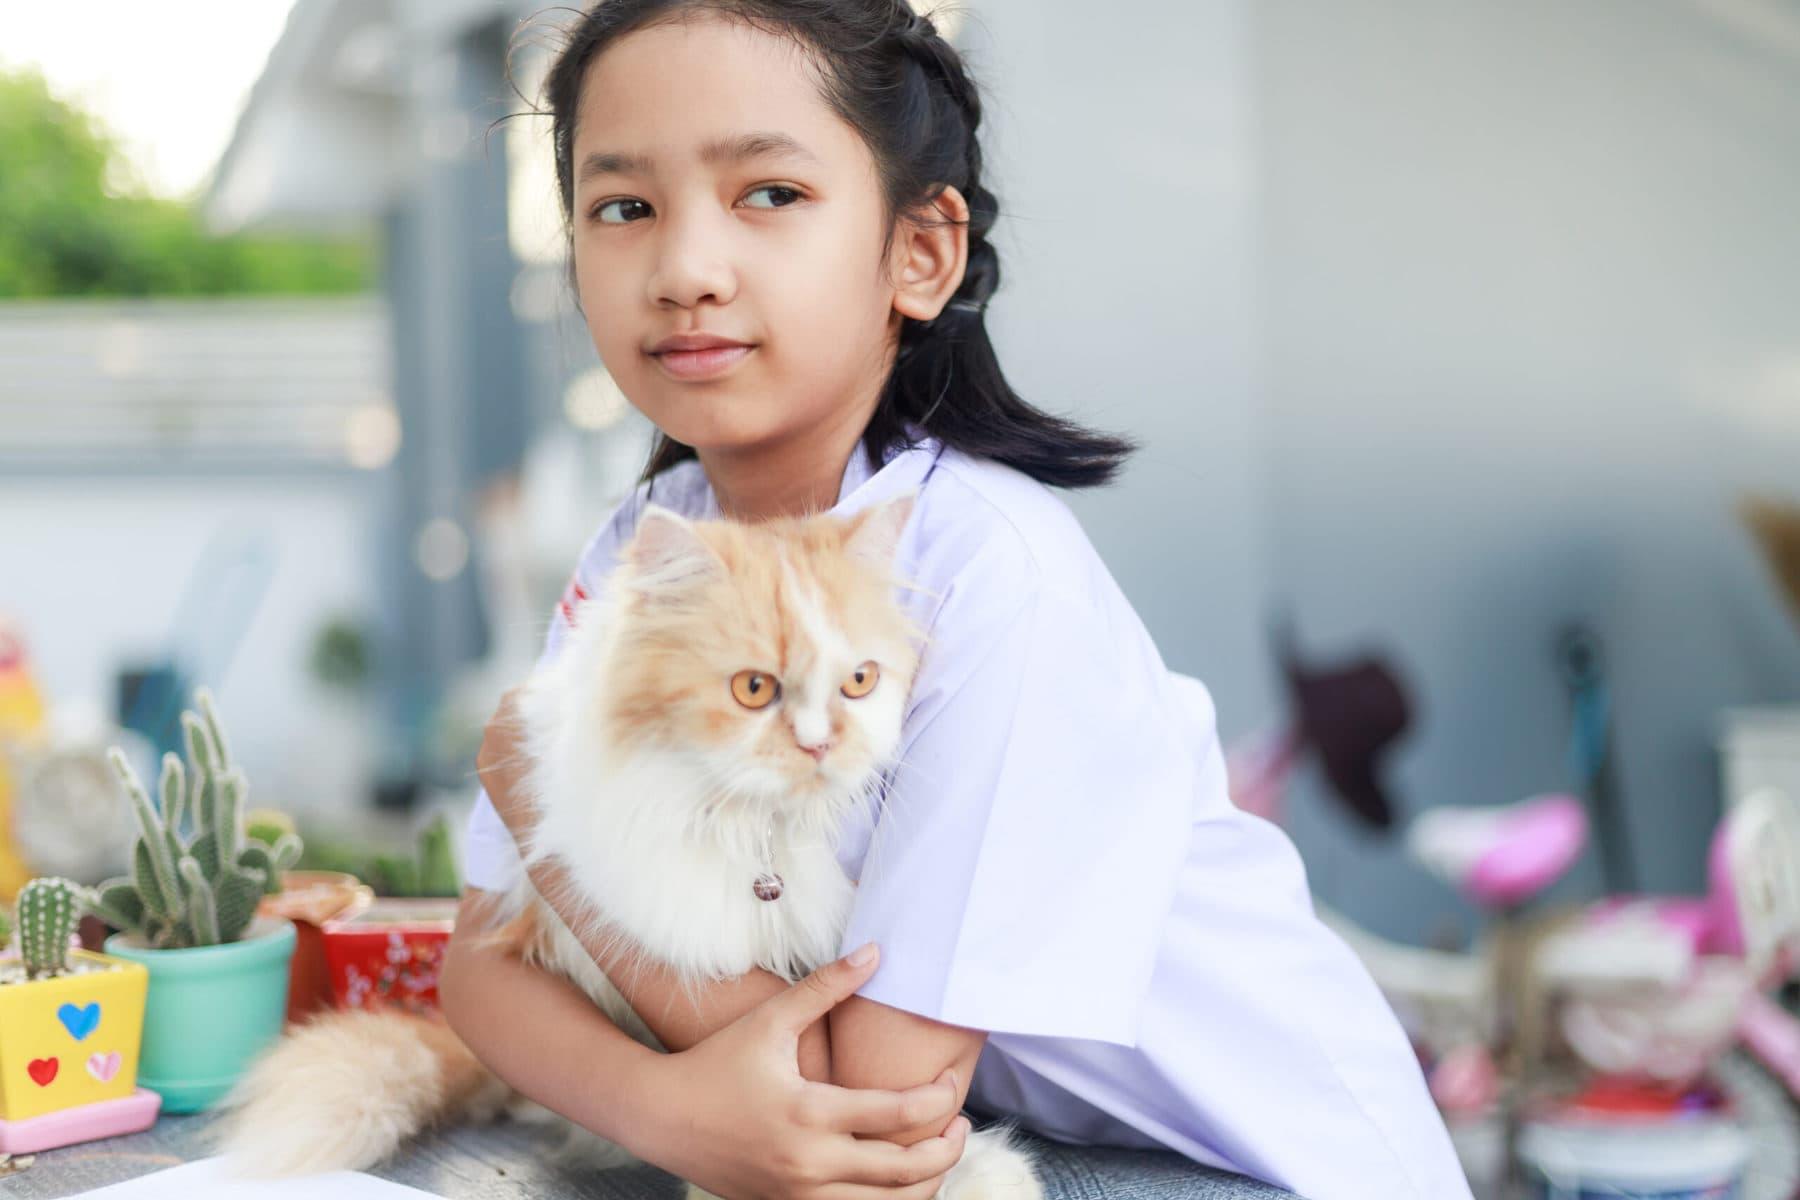 Anxious girl hugging her cat.